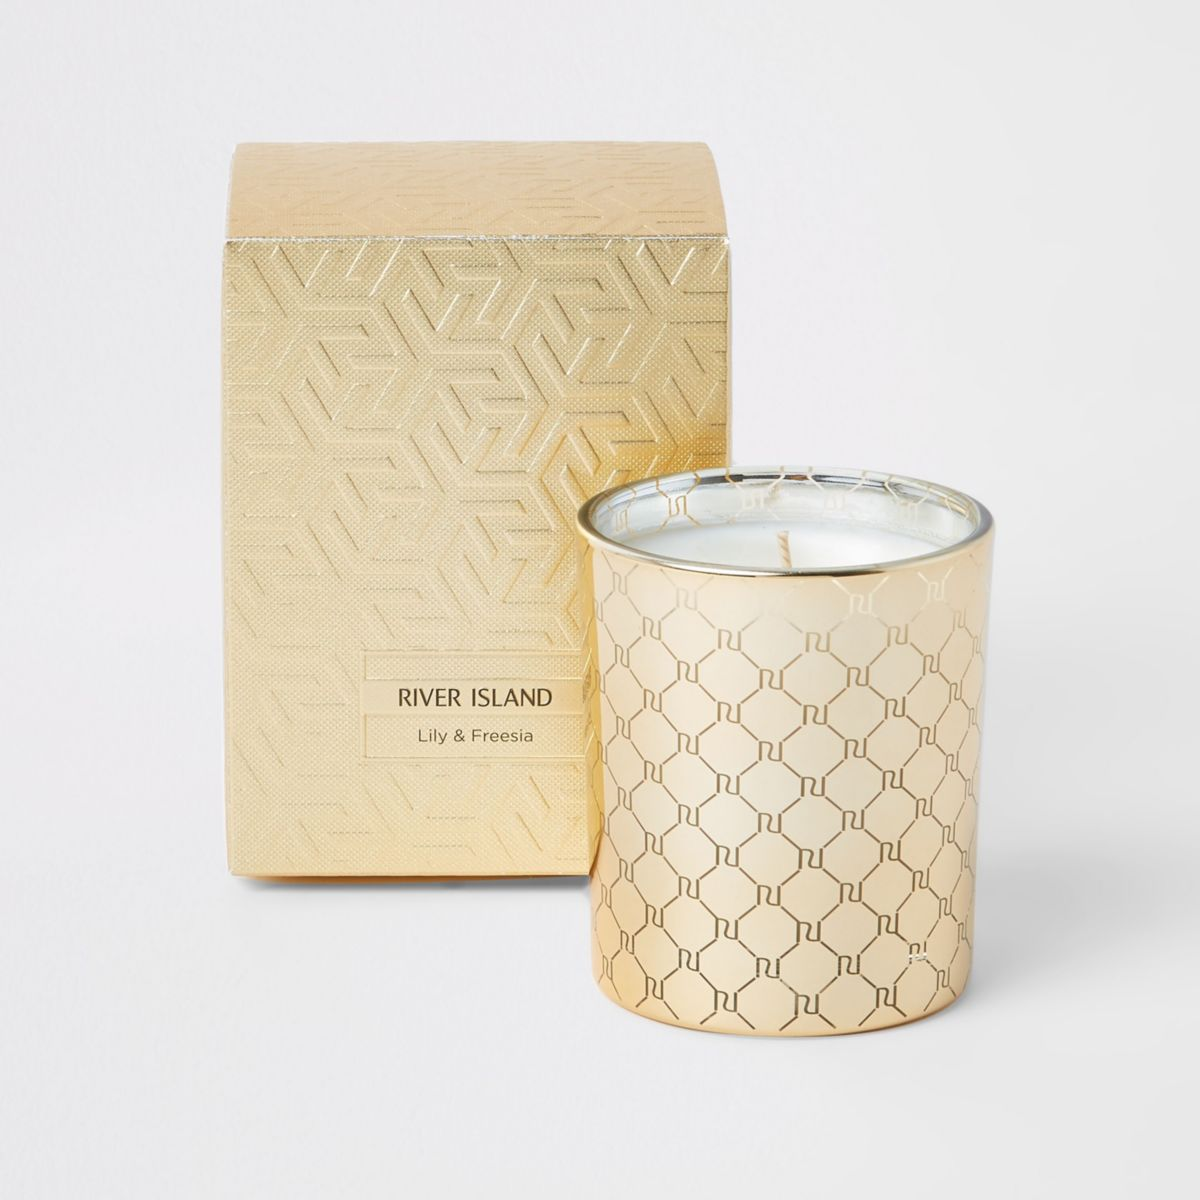 Orange & cedarwood monochrome candle